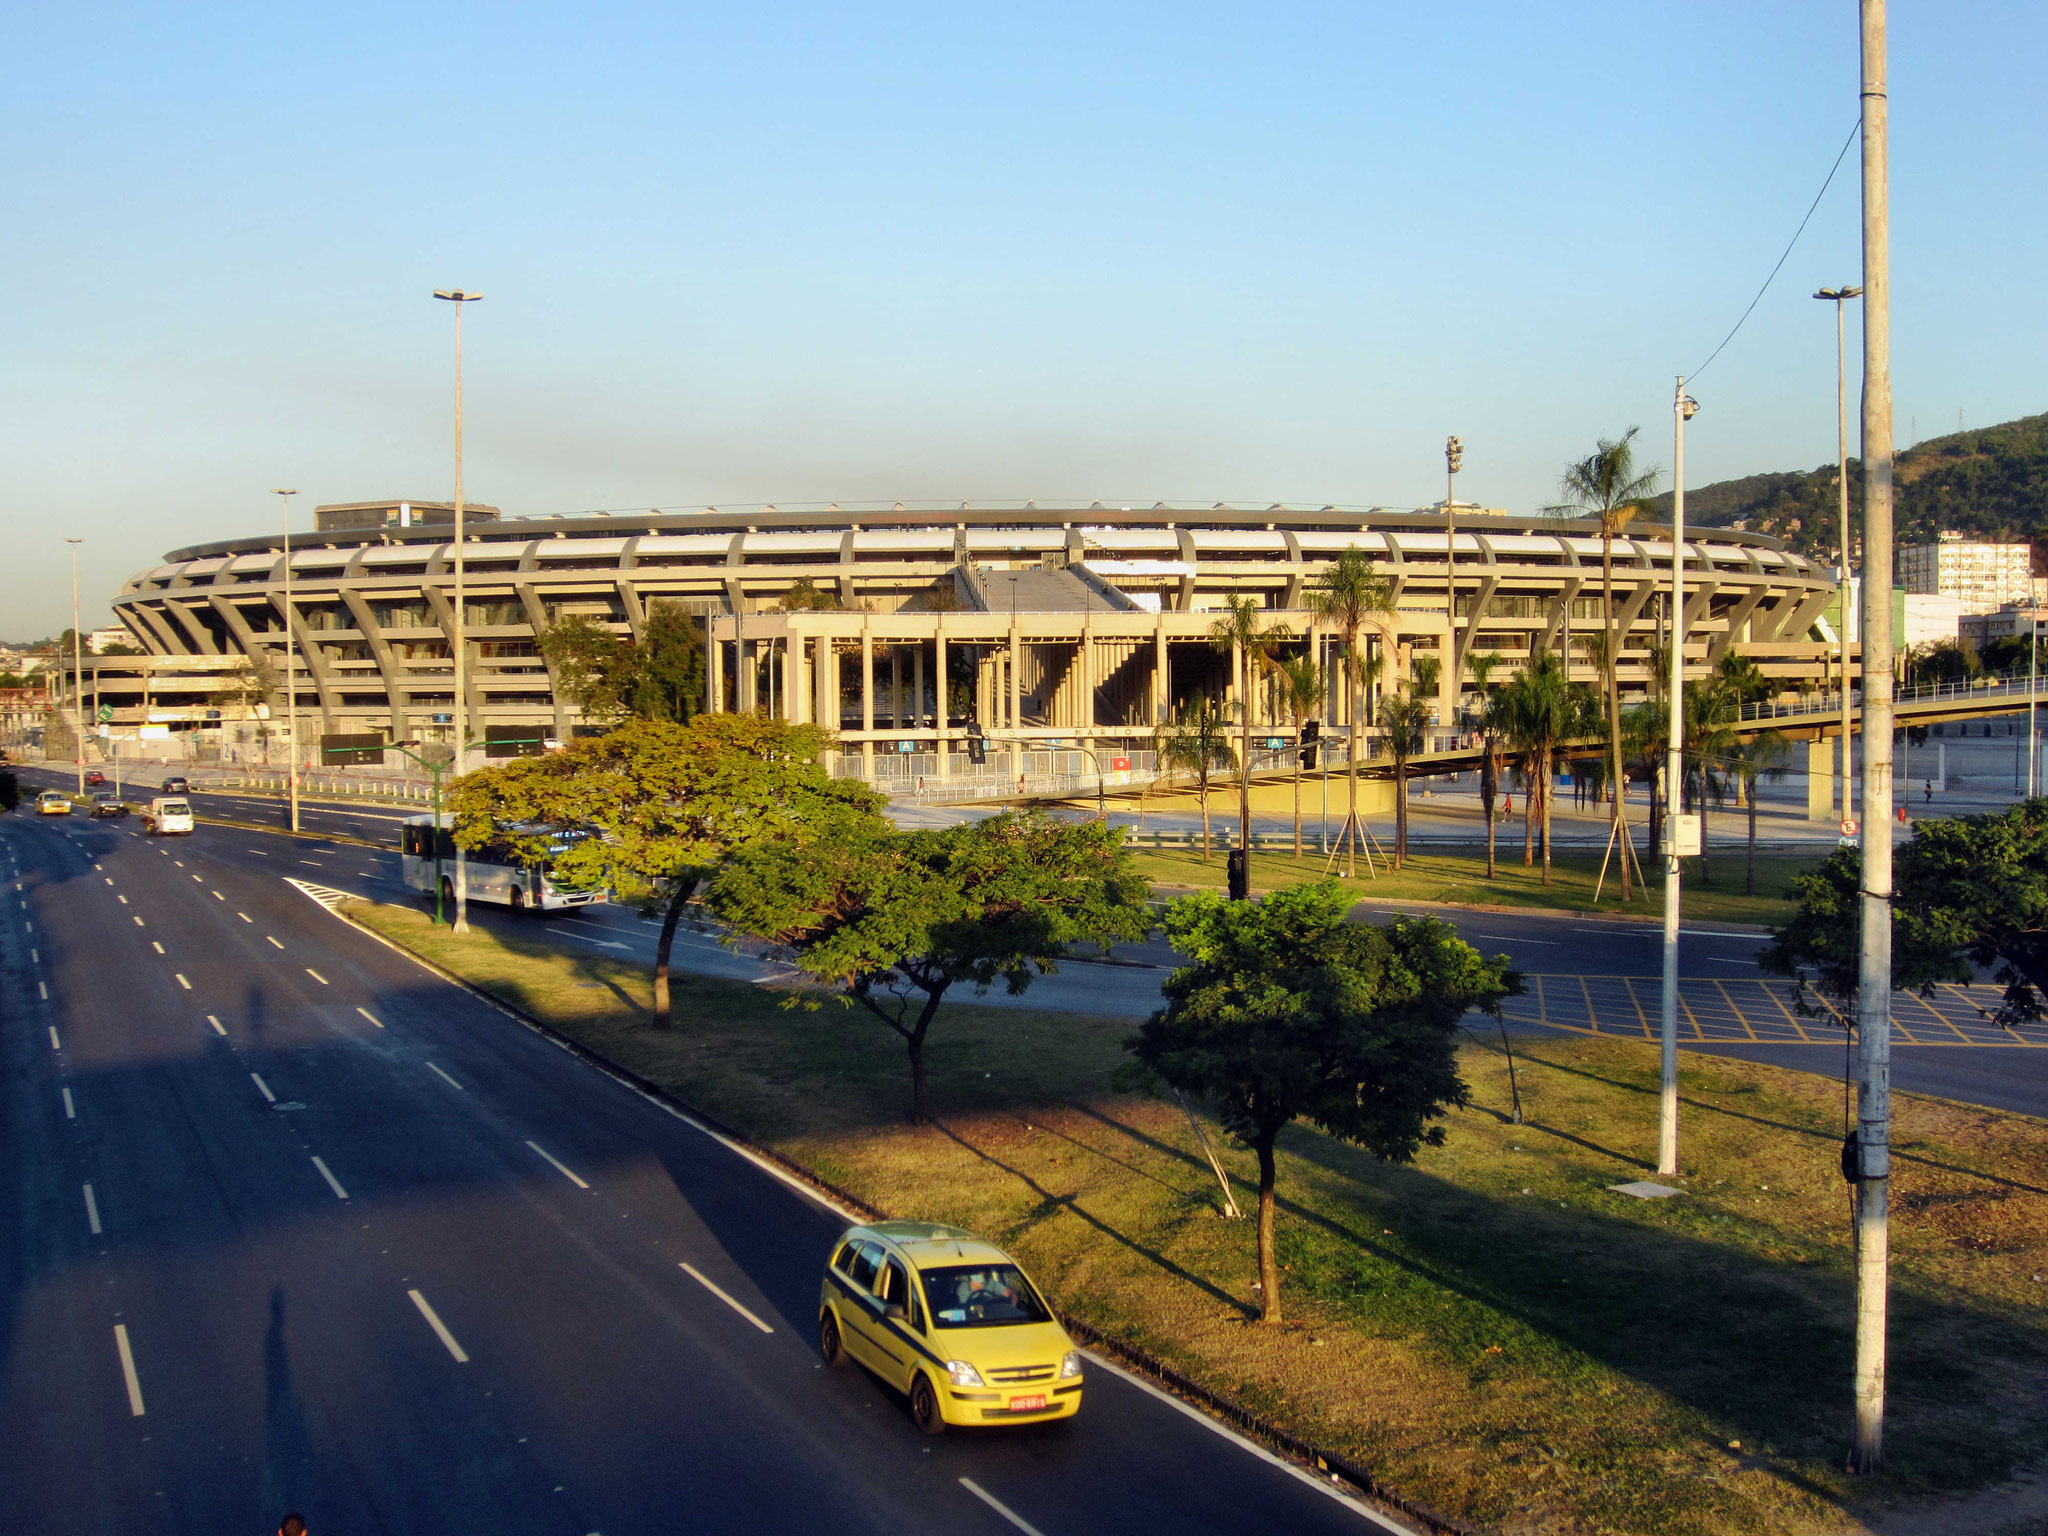 Das weltberühmte Maracanastadion